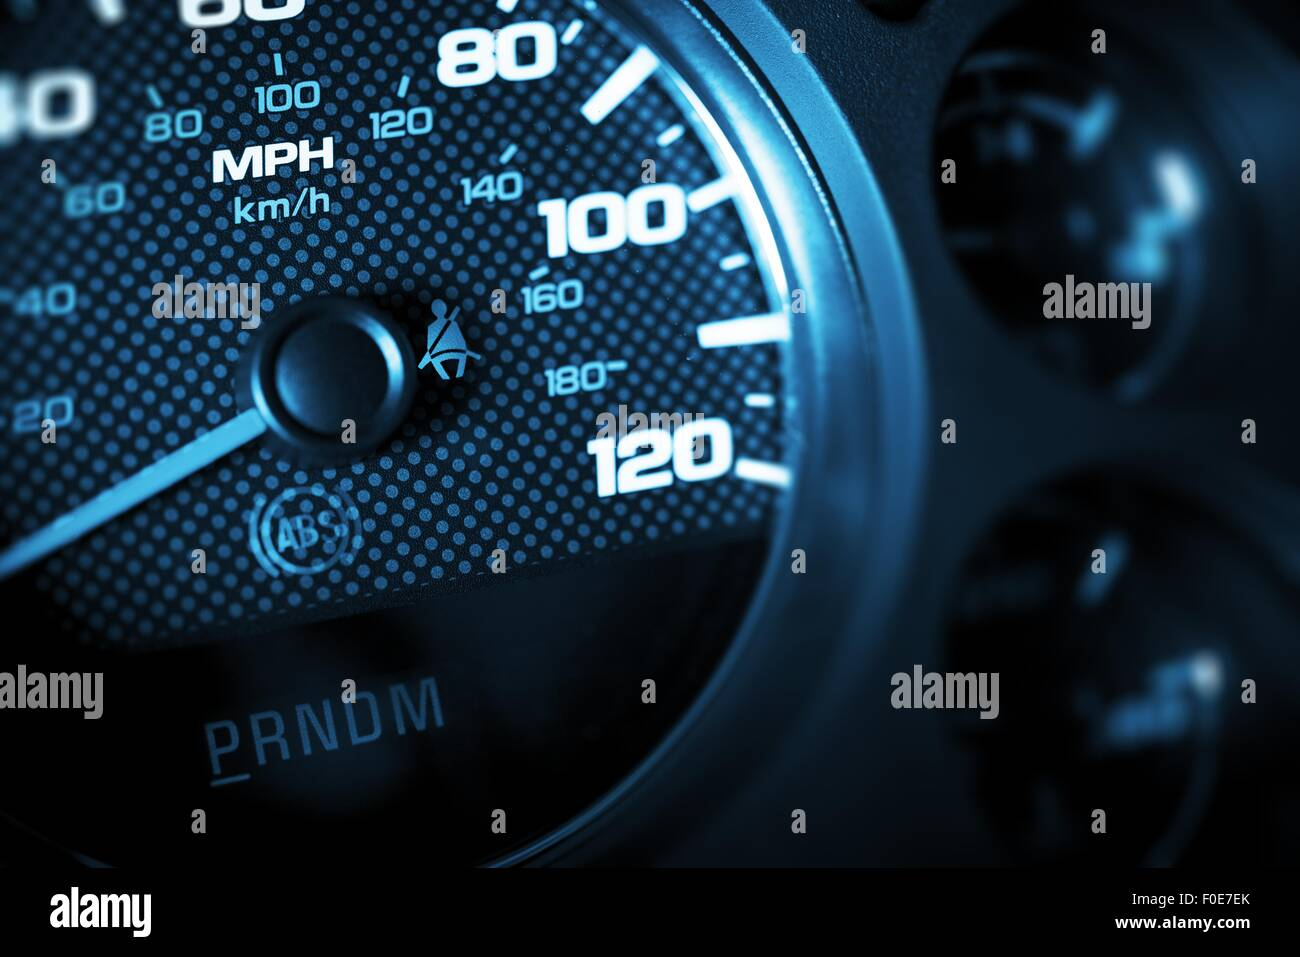 Driving Speed Control. Auto Drehzahlmesser Nahaufnahme. Dunkelblaue Farbe Verschneidung. Stockbild